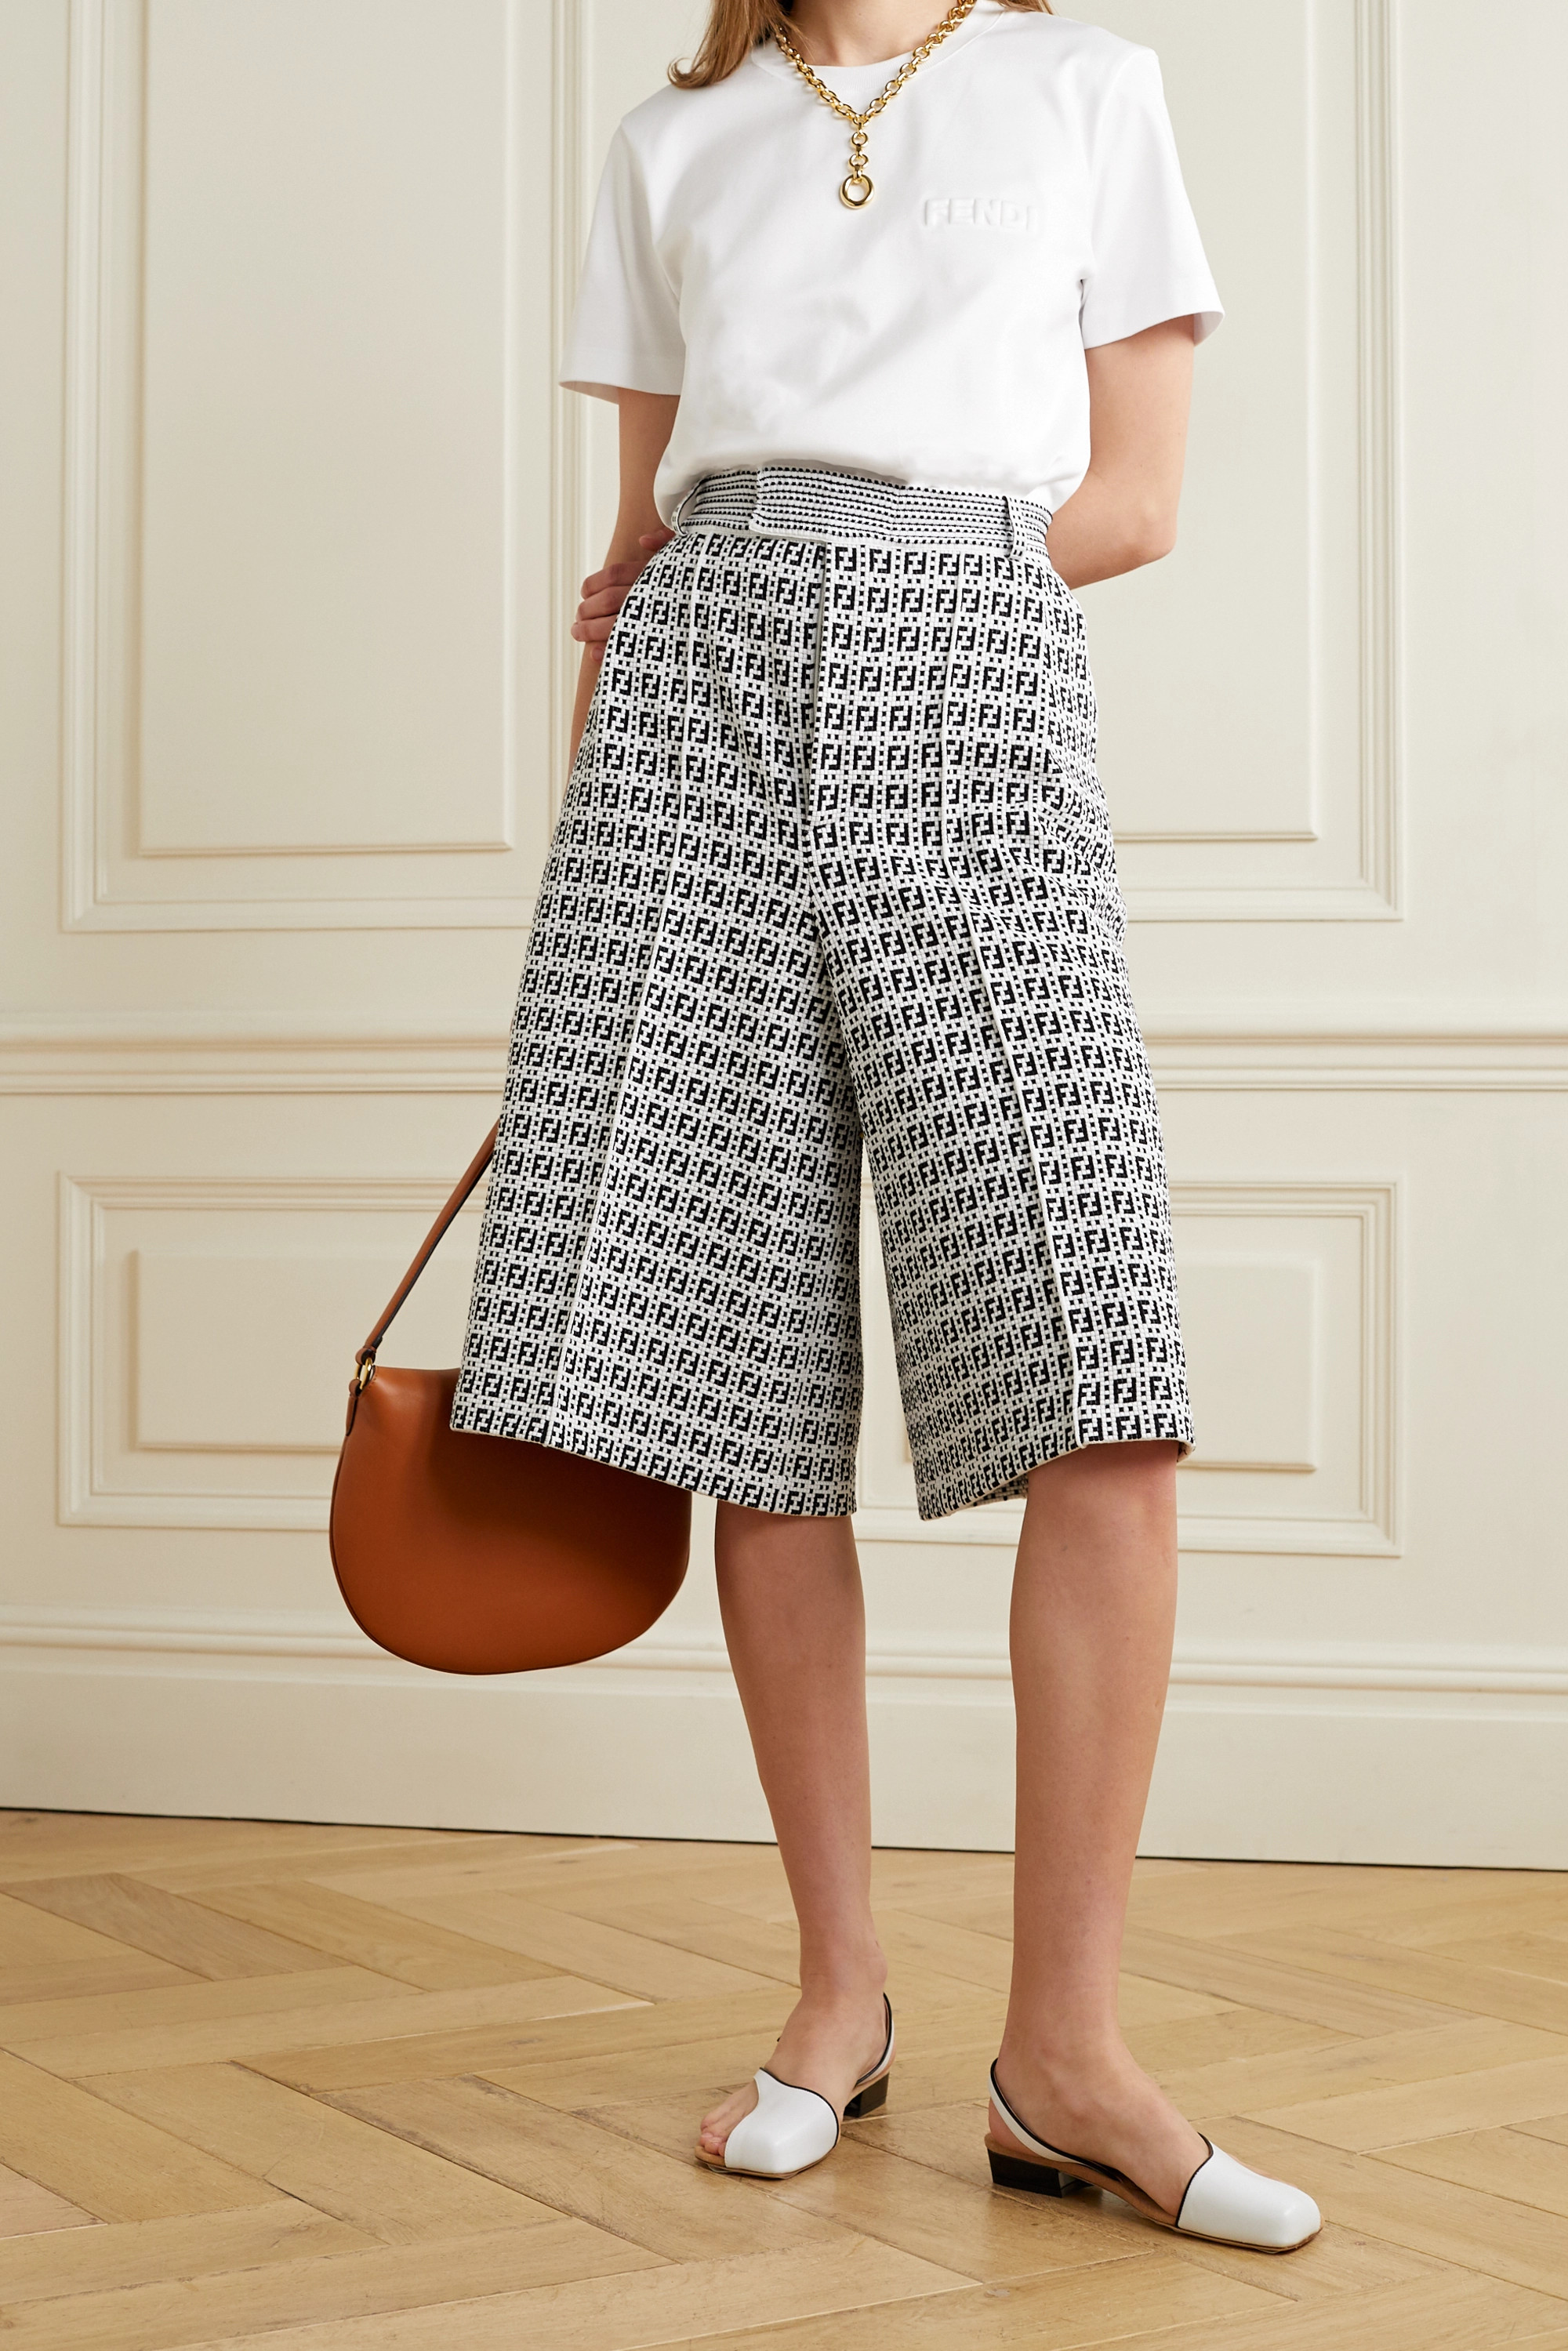 Fendi Shorts aus Jacquard-Strick